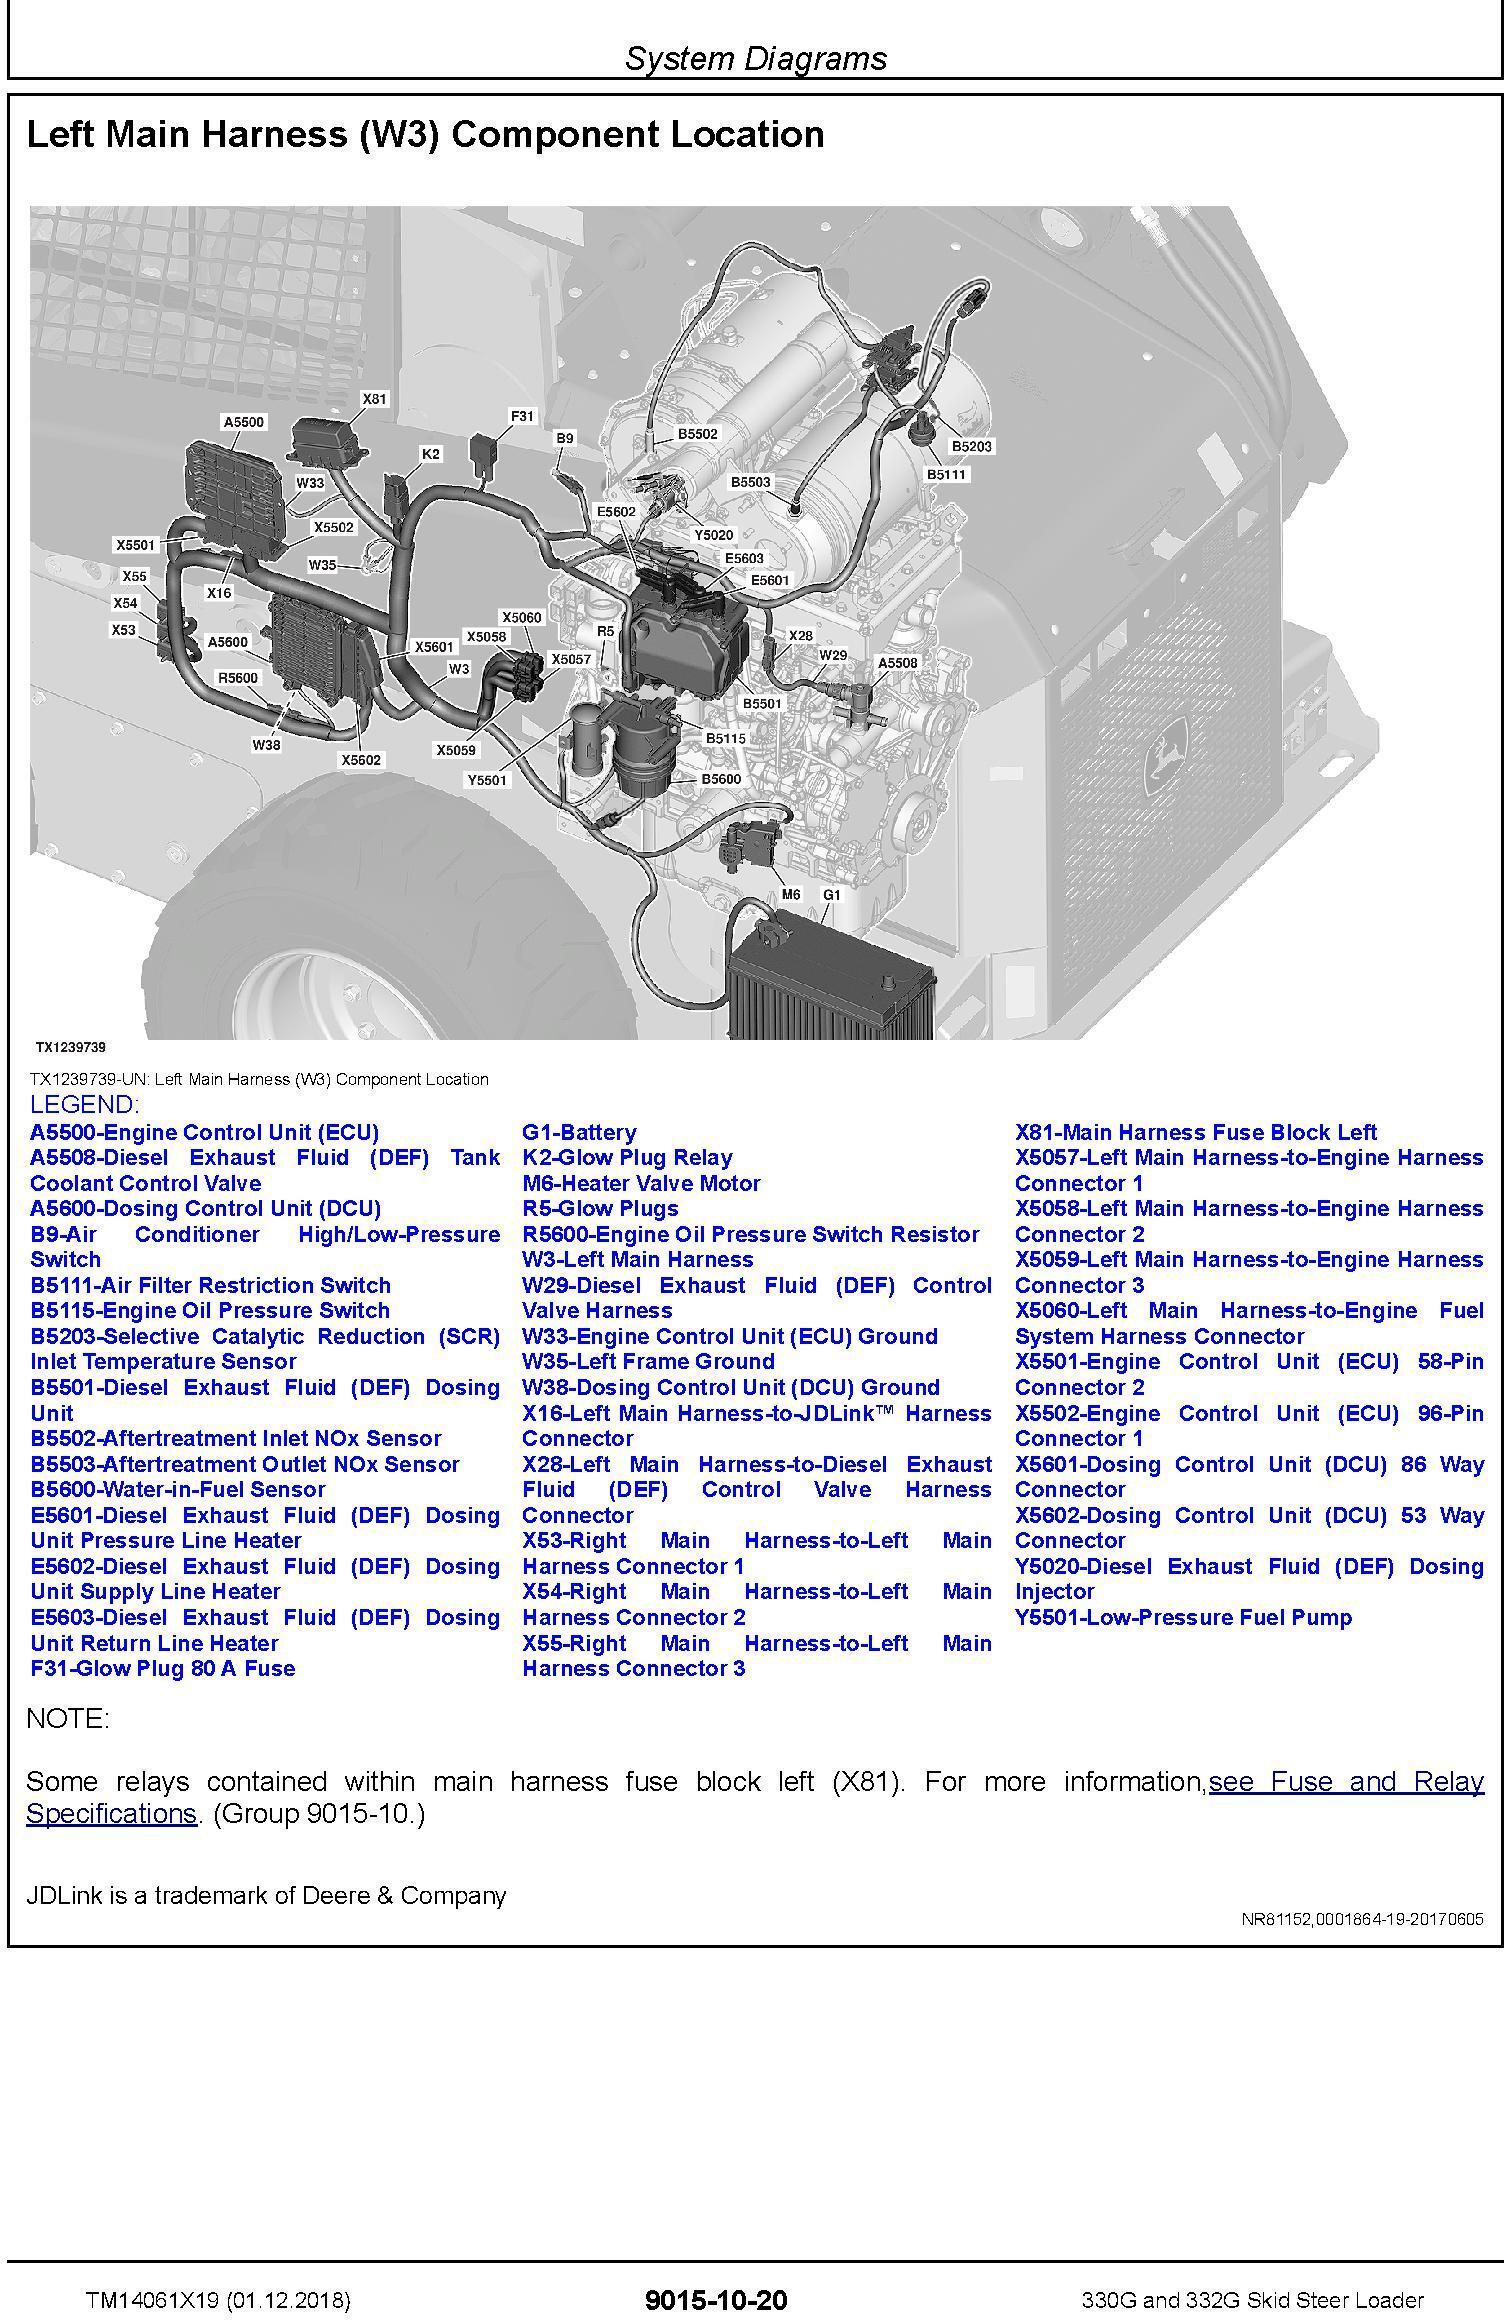 John Deere 330G and 332G Skid Steer Loader Operation & Test Technical Service Manual (TM14061X19) - 1